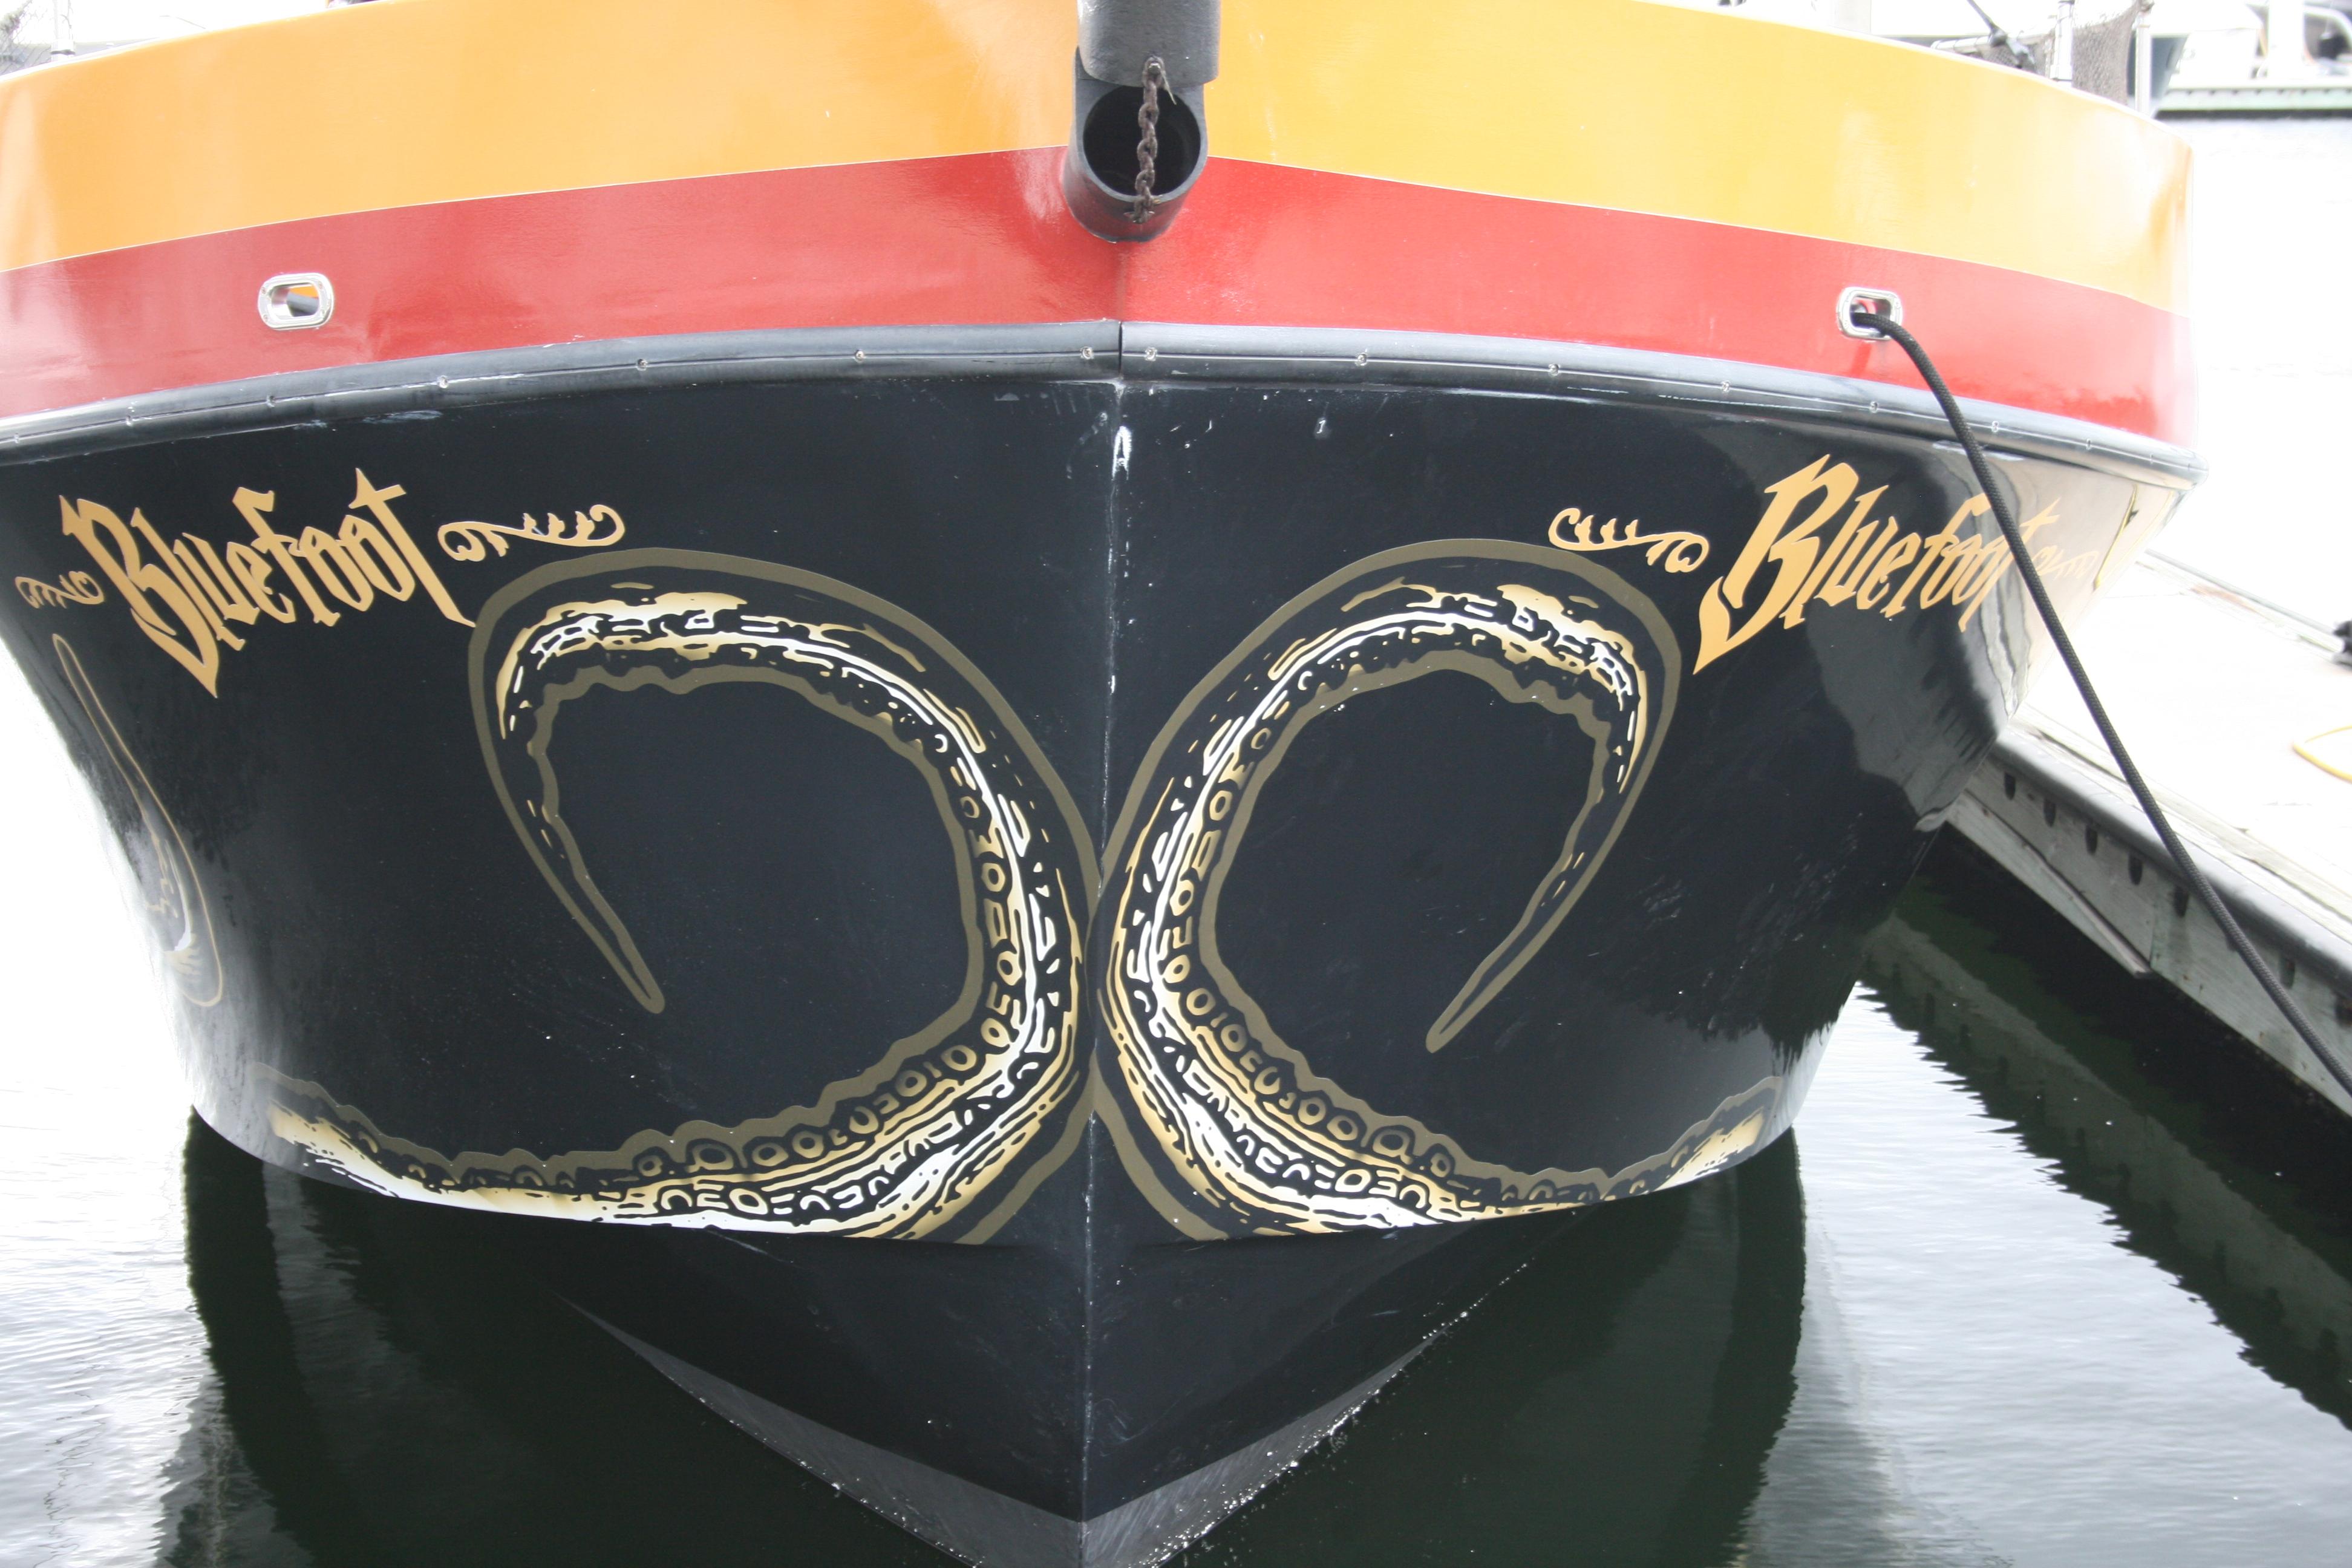 Vinyl Custom Boat Graphics Fort Lauderdale Florida Octopus - Boat decals custom graphics